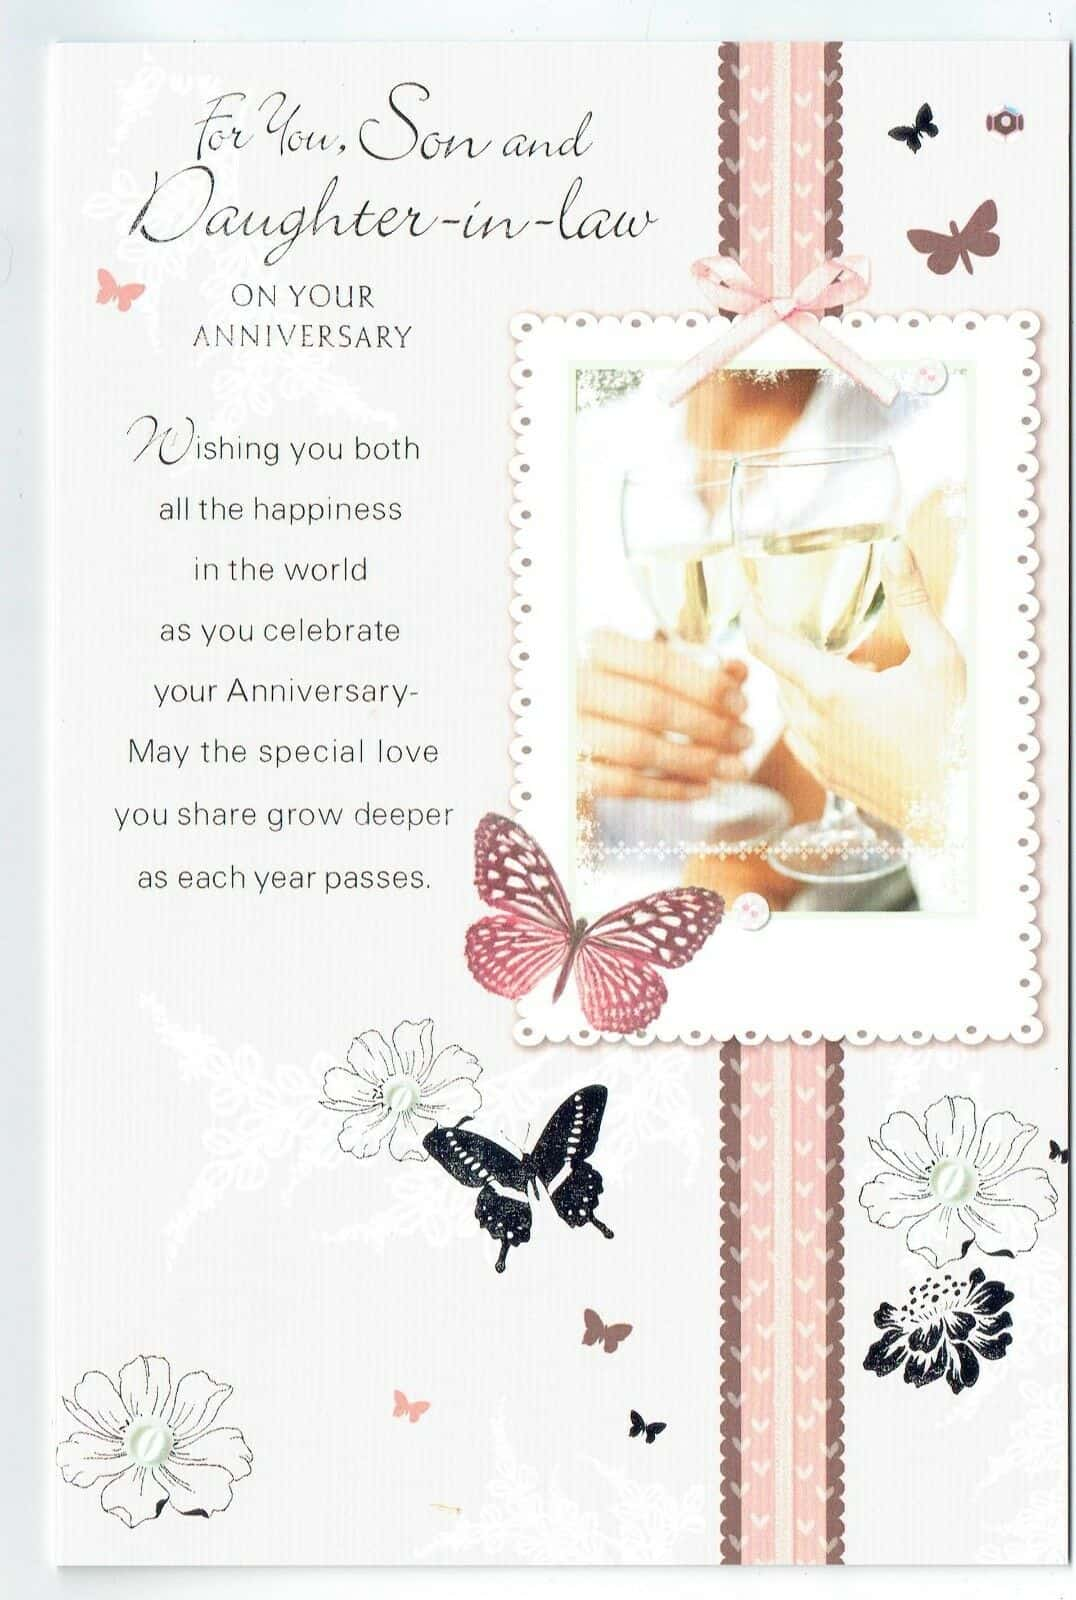 CUTE HAPPY ANNIVERSARY SON DAUGHTER-IN-LAW ANNIVERSARY CARD 2 DESIGNS 1ST P/&P